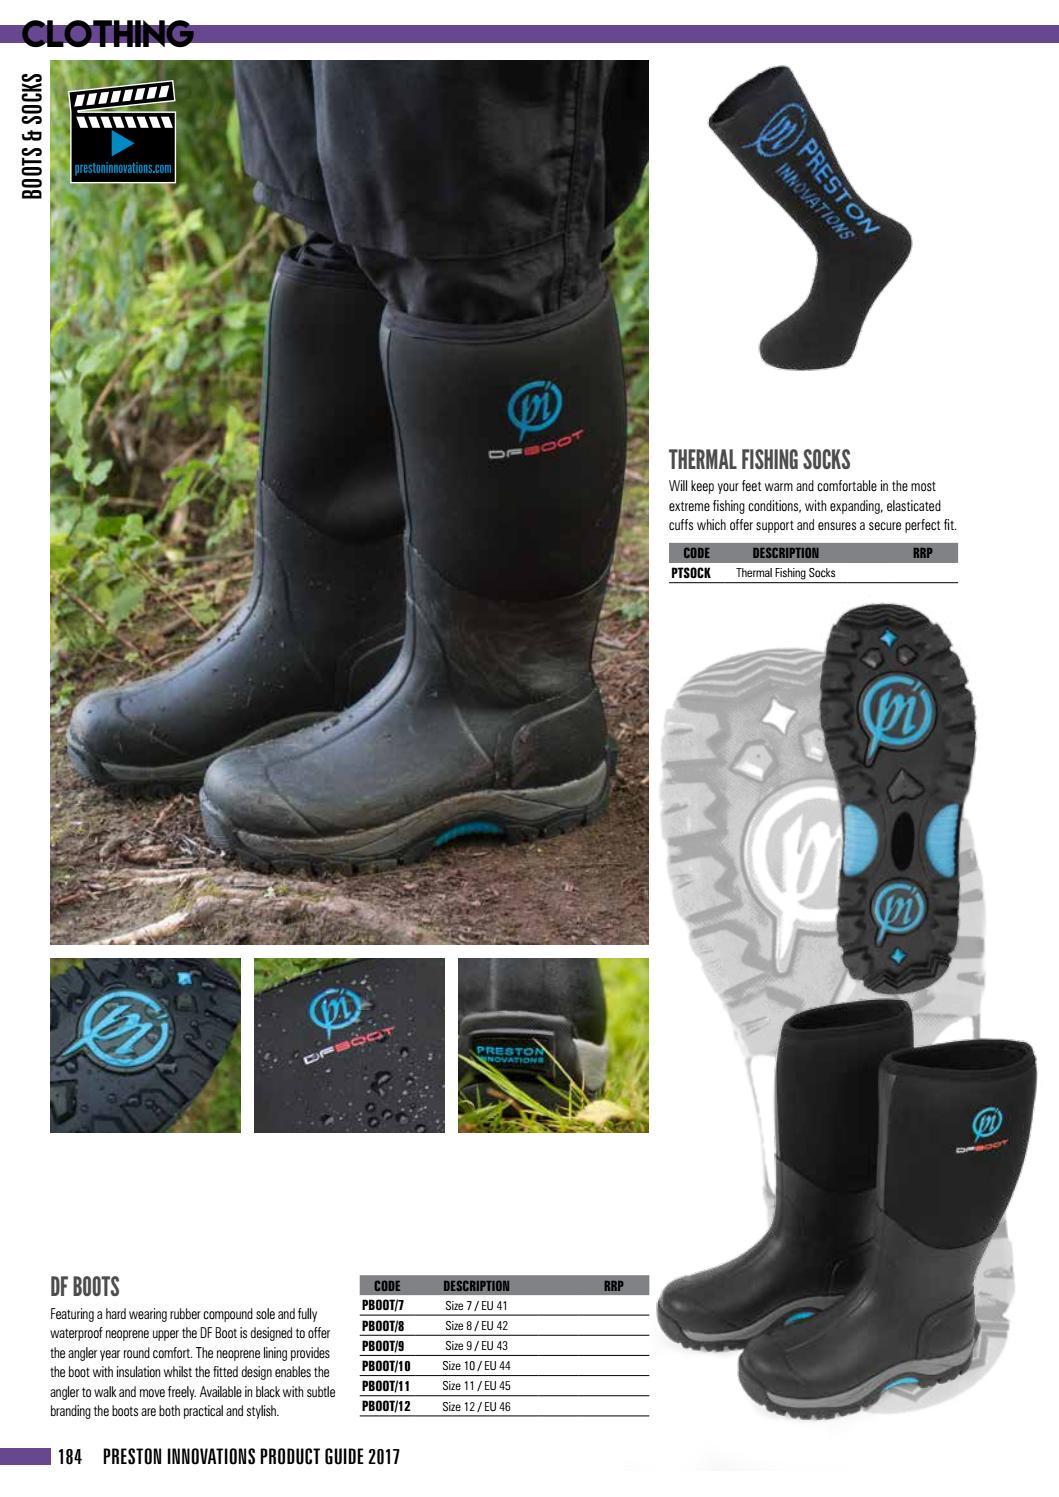 Neoprene upper SSP £80 Size UK 8 Preston Innovations DF Waterproof Boots